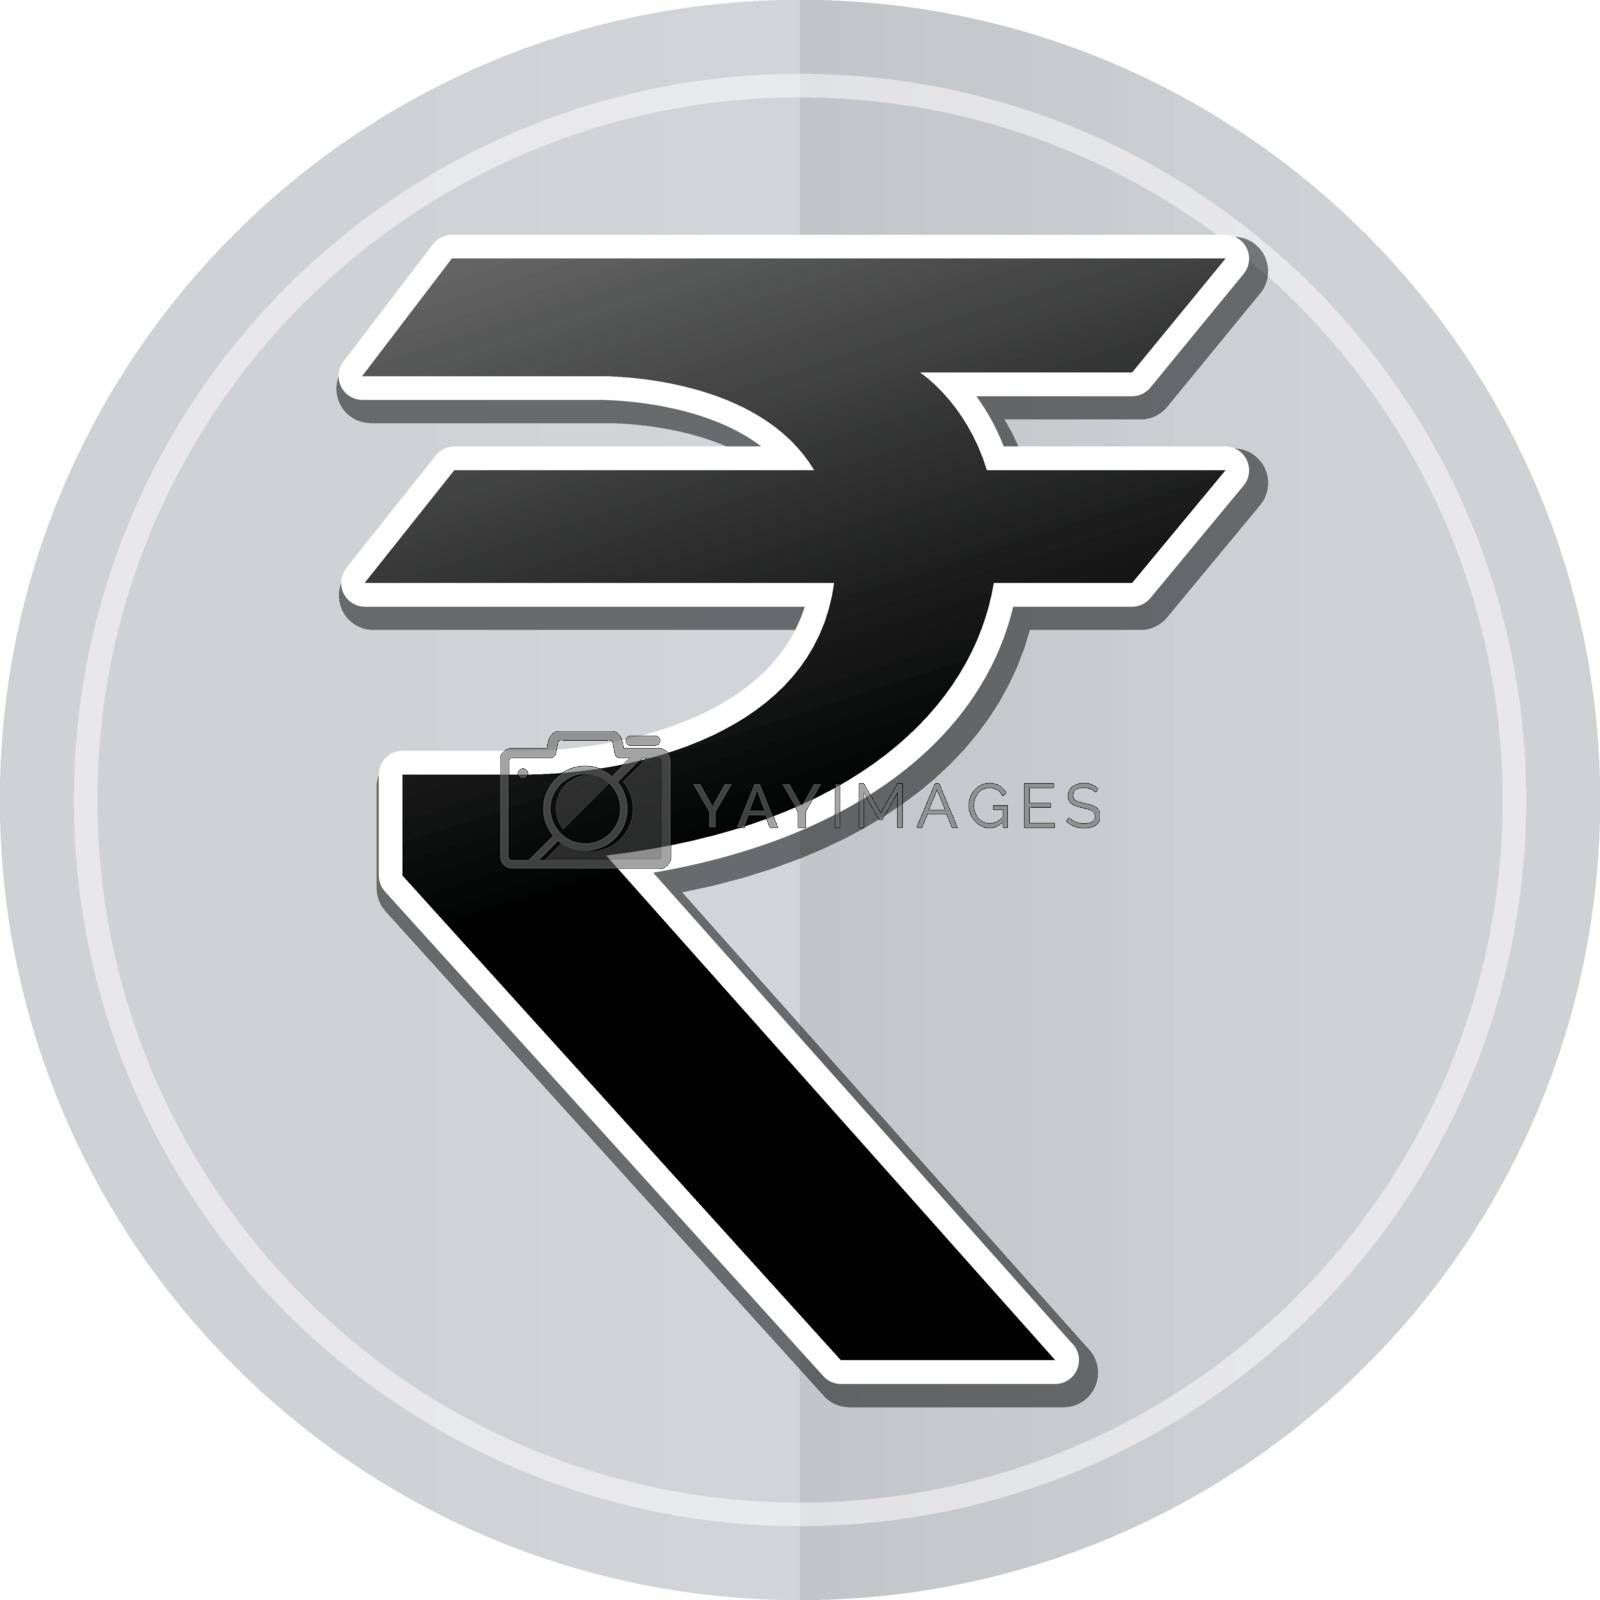 Illustration of rupee sticker icon simple design